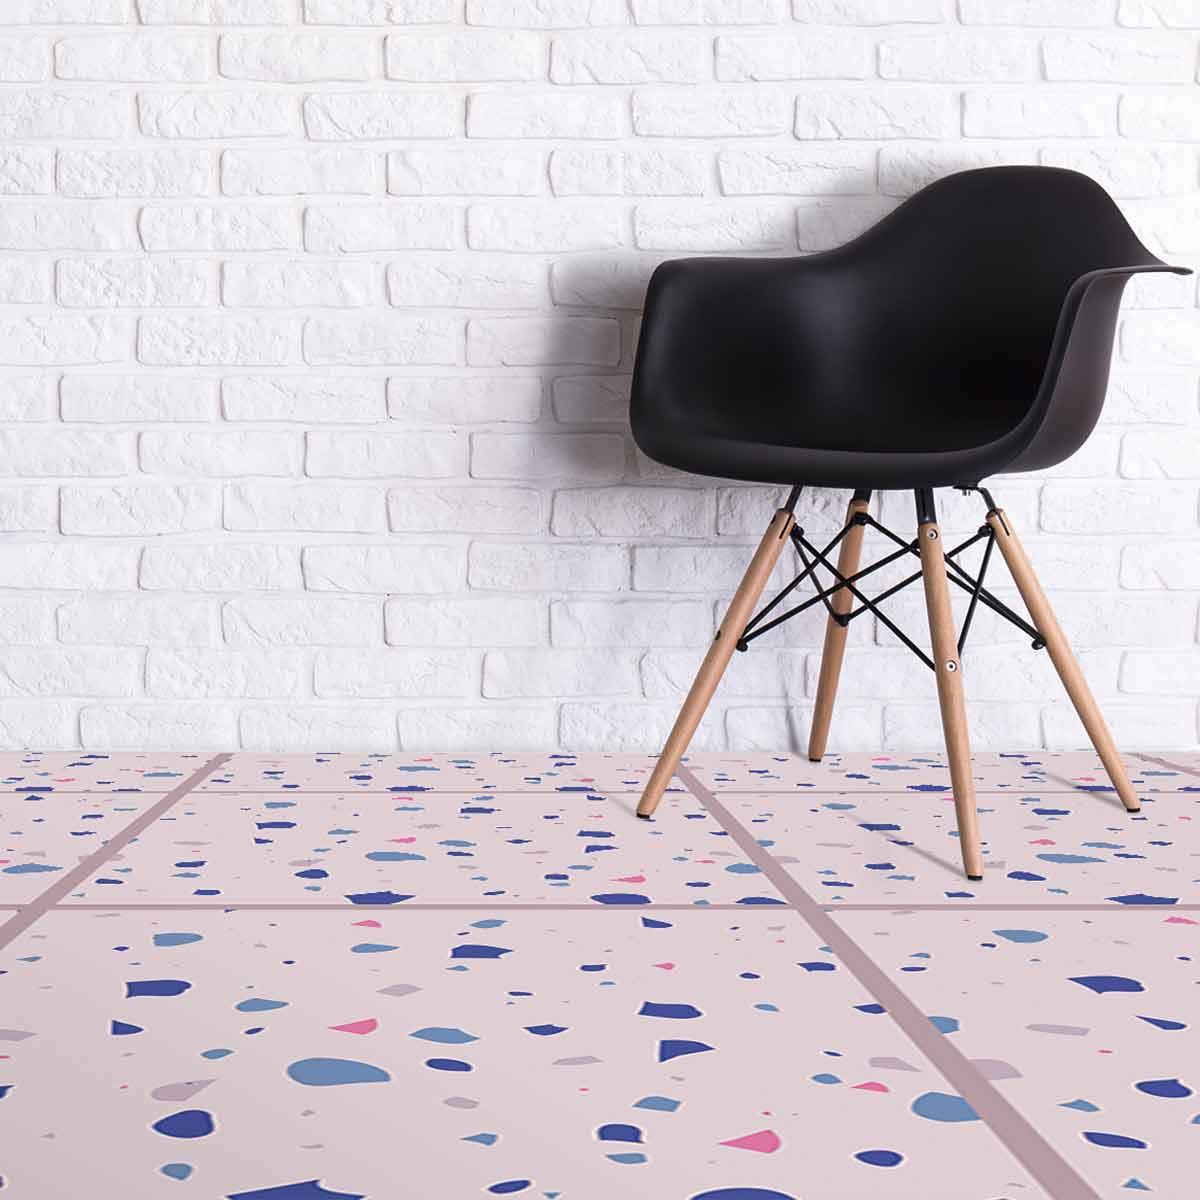 Image showing a room with Chiara Terrazzo style Italian tile vinyl flooring by forthefloorandmore.com